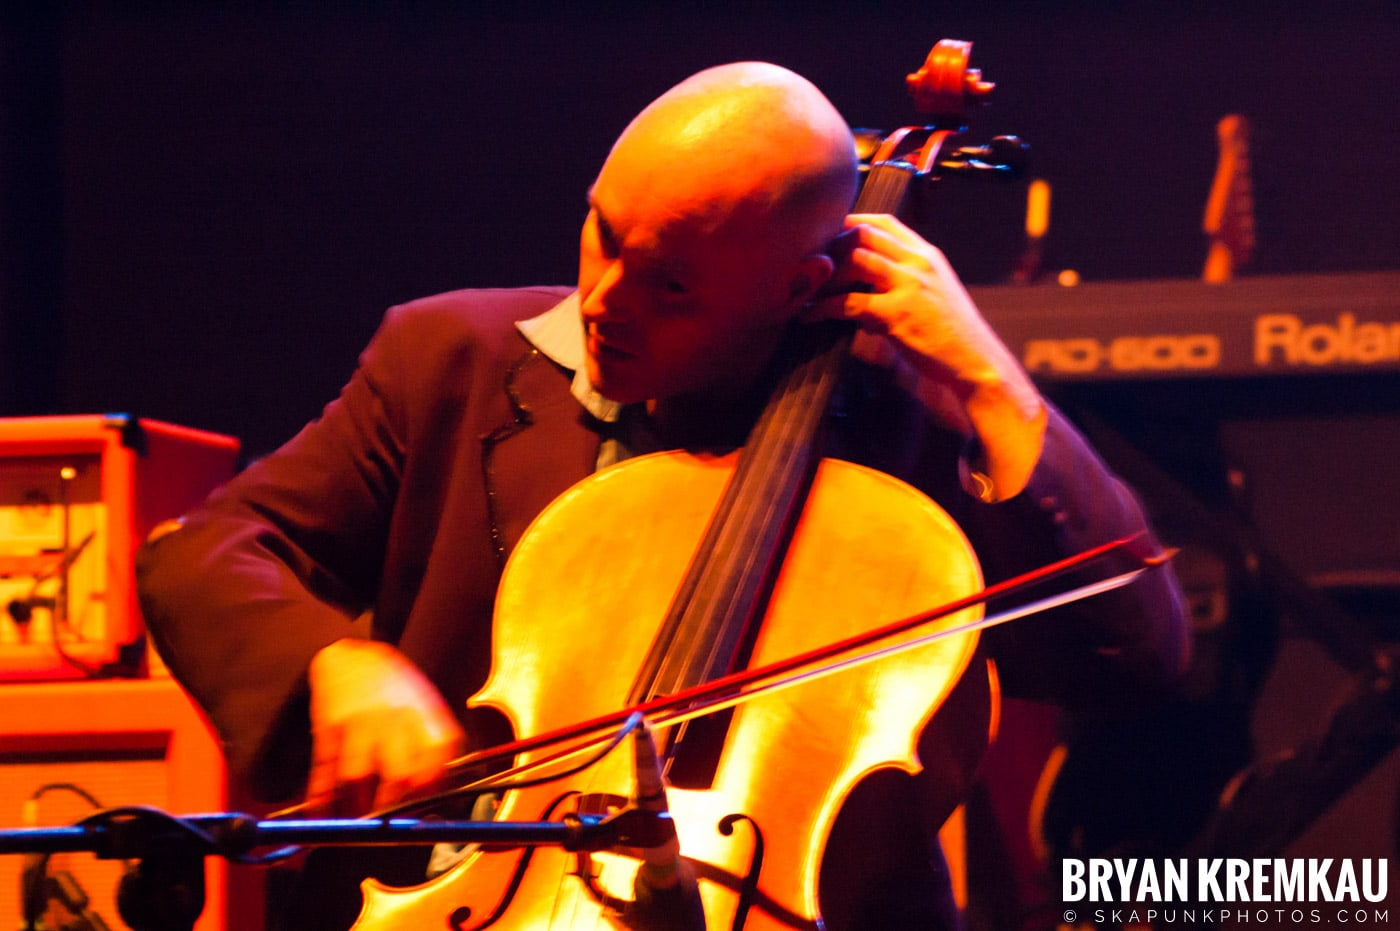 Larrikin Love @ Brixton Academy, London UK - 12.17.06 (4)